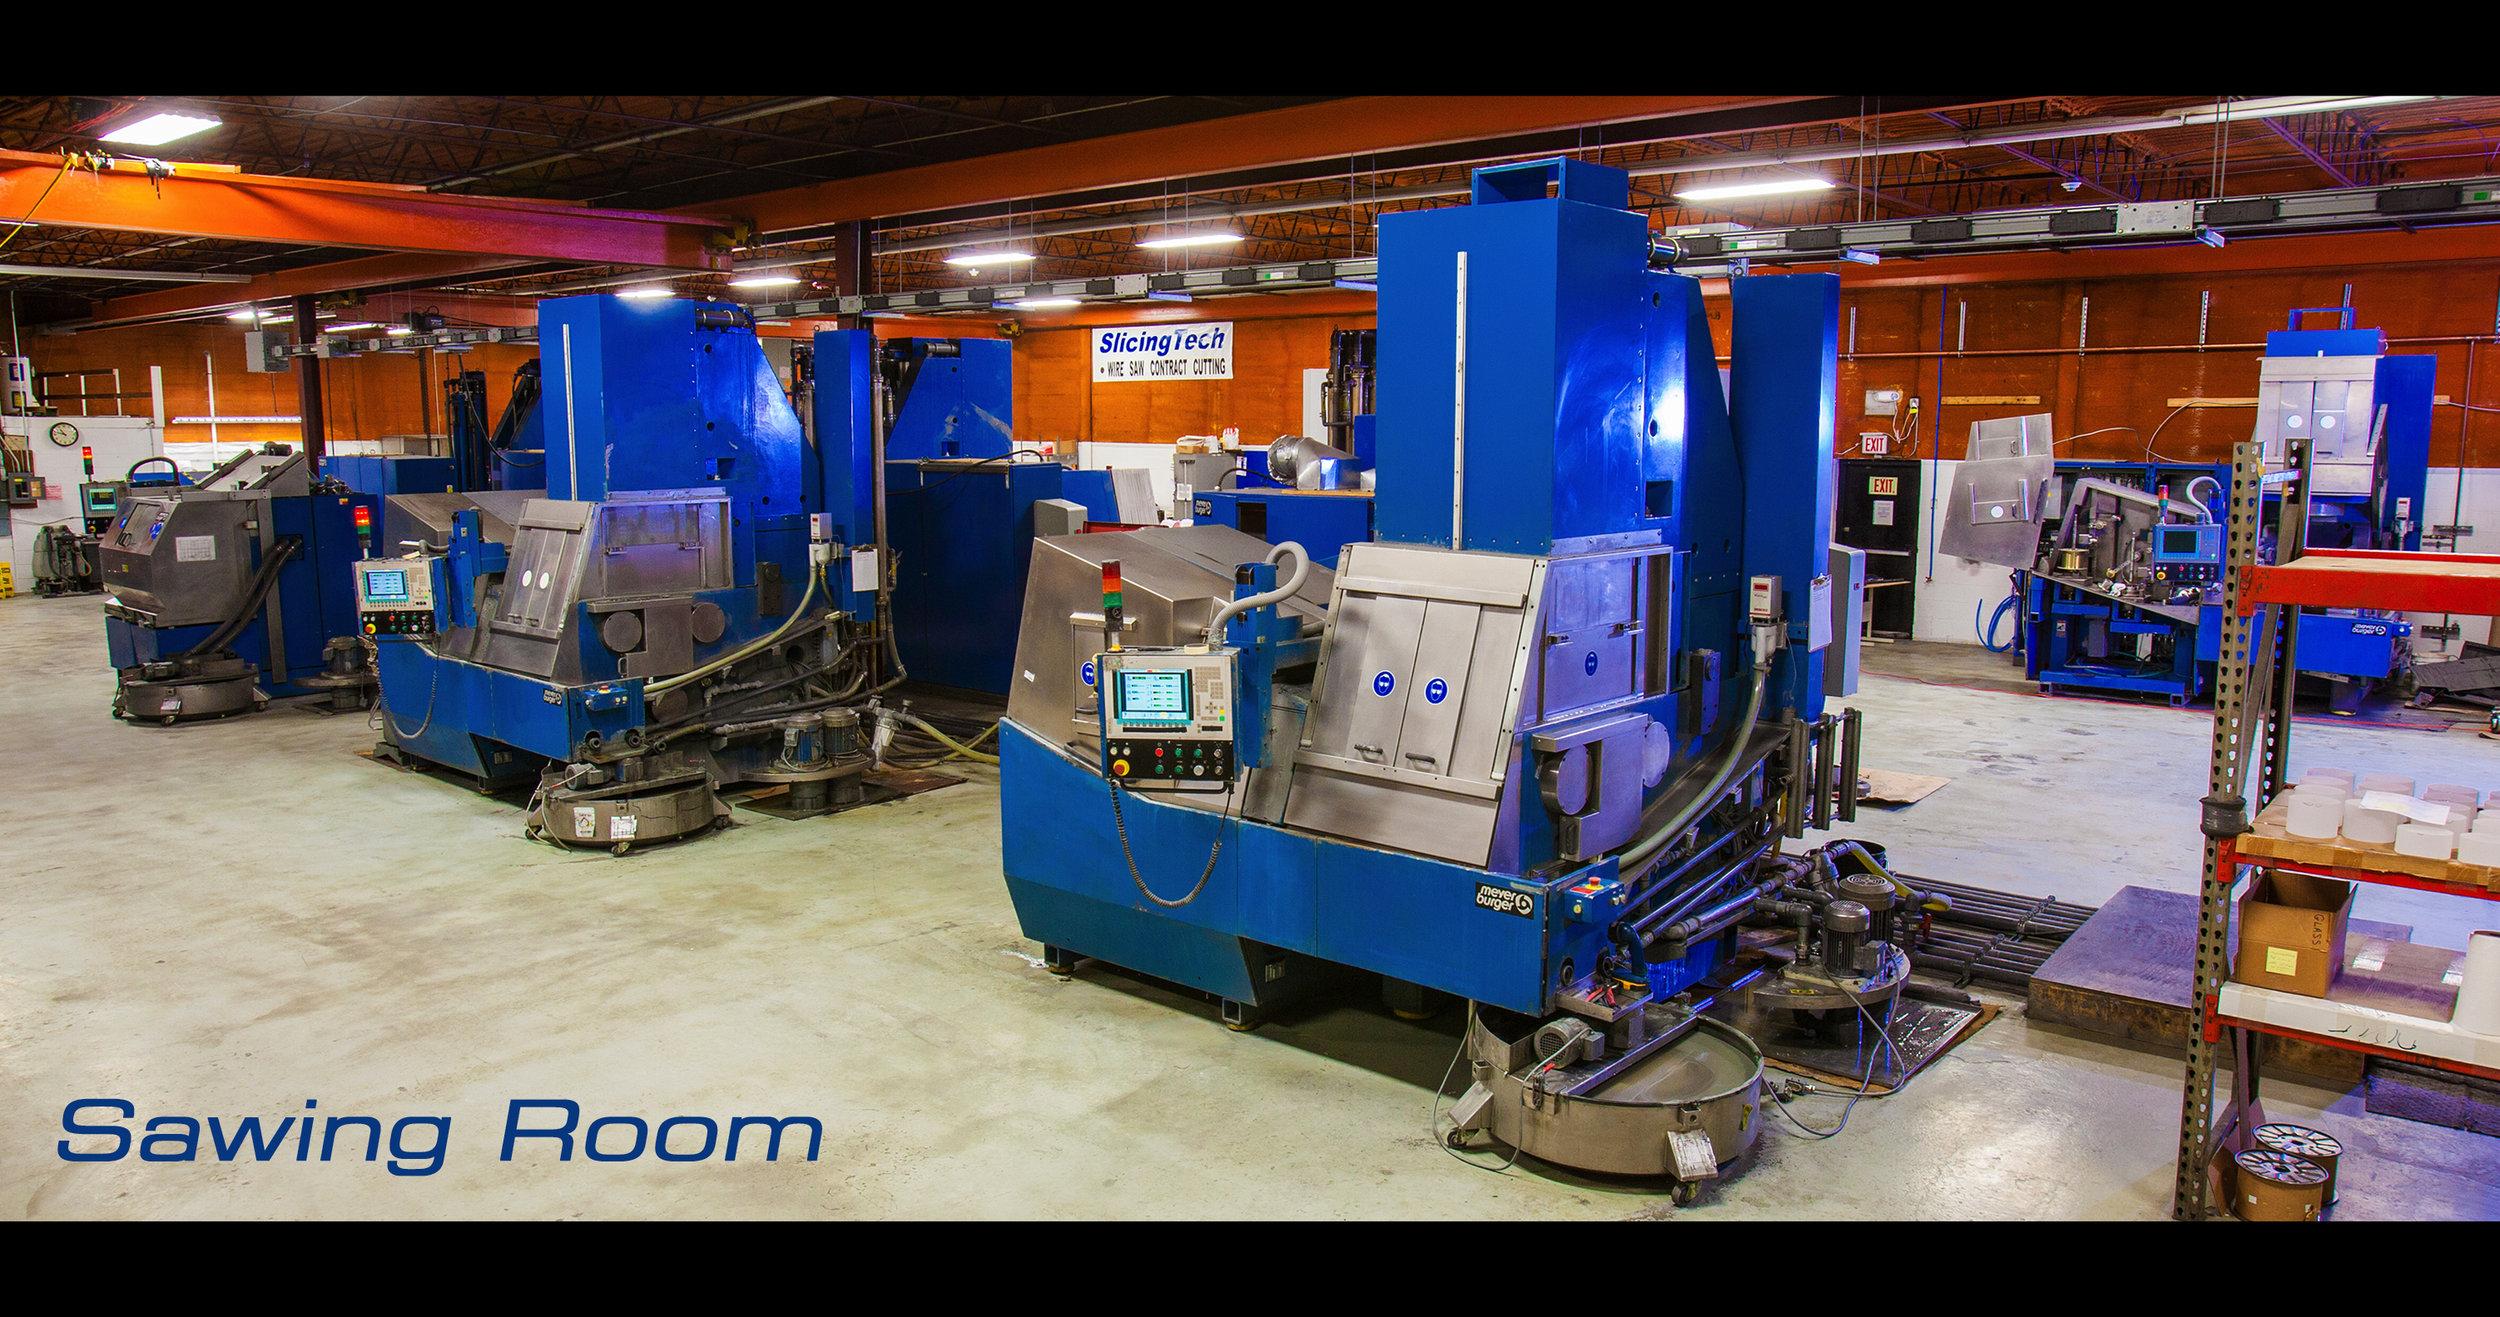 SlicingTech Sawing Room